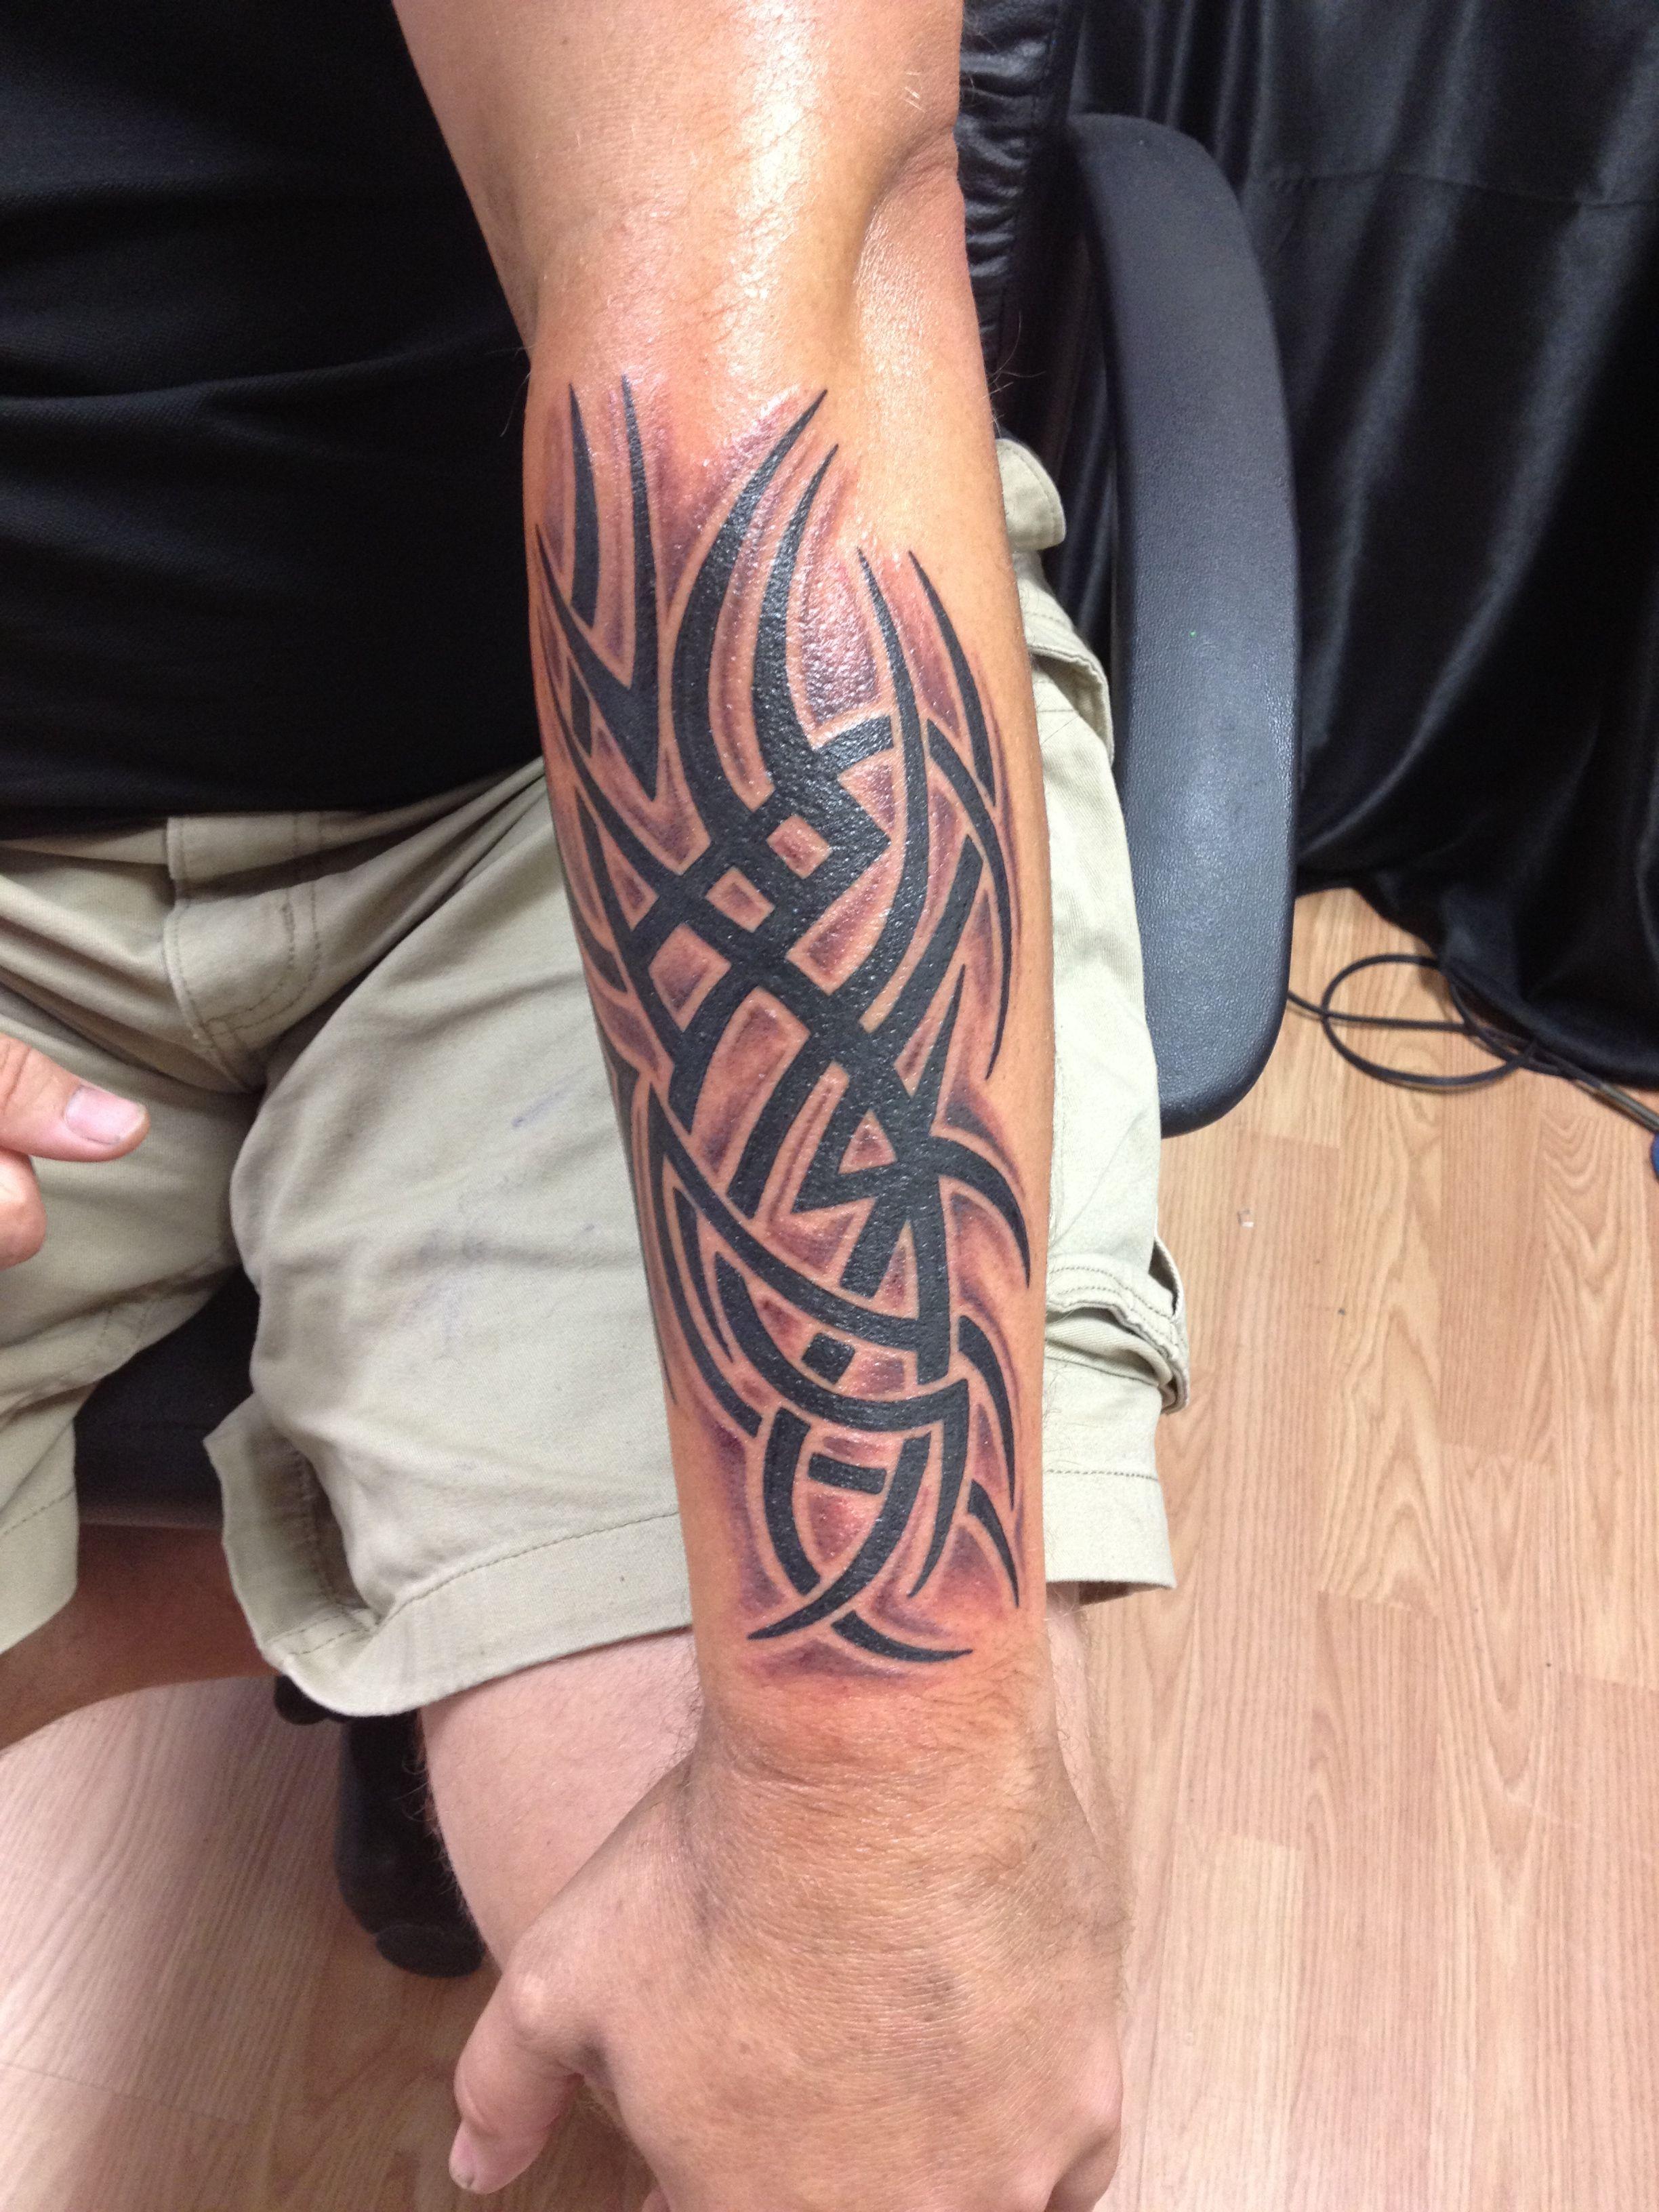 Pin By Dean Thomas On Tattoos Tribal Forearm Tattoos Tribal Tattoos For Men Tribal Tattoos